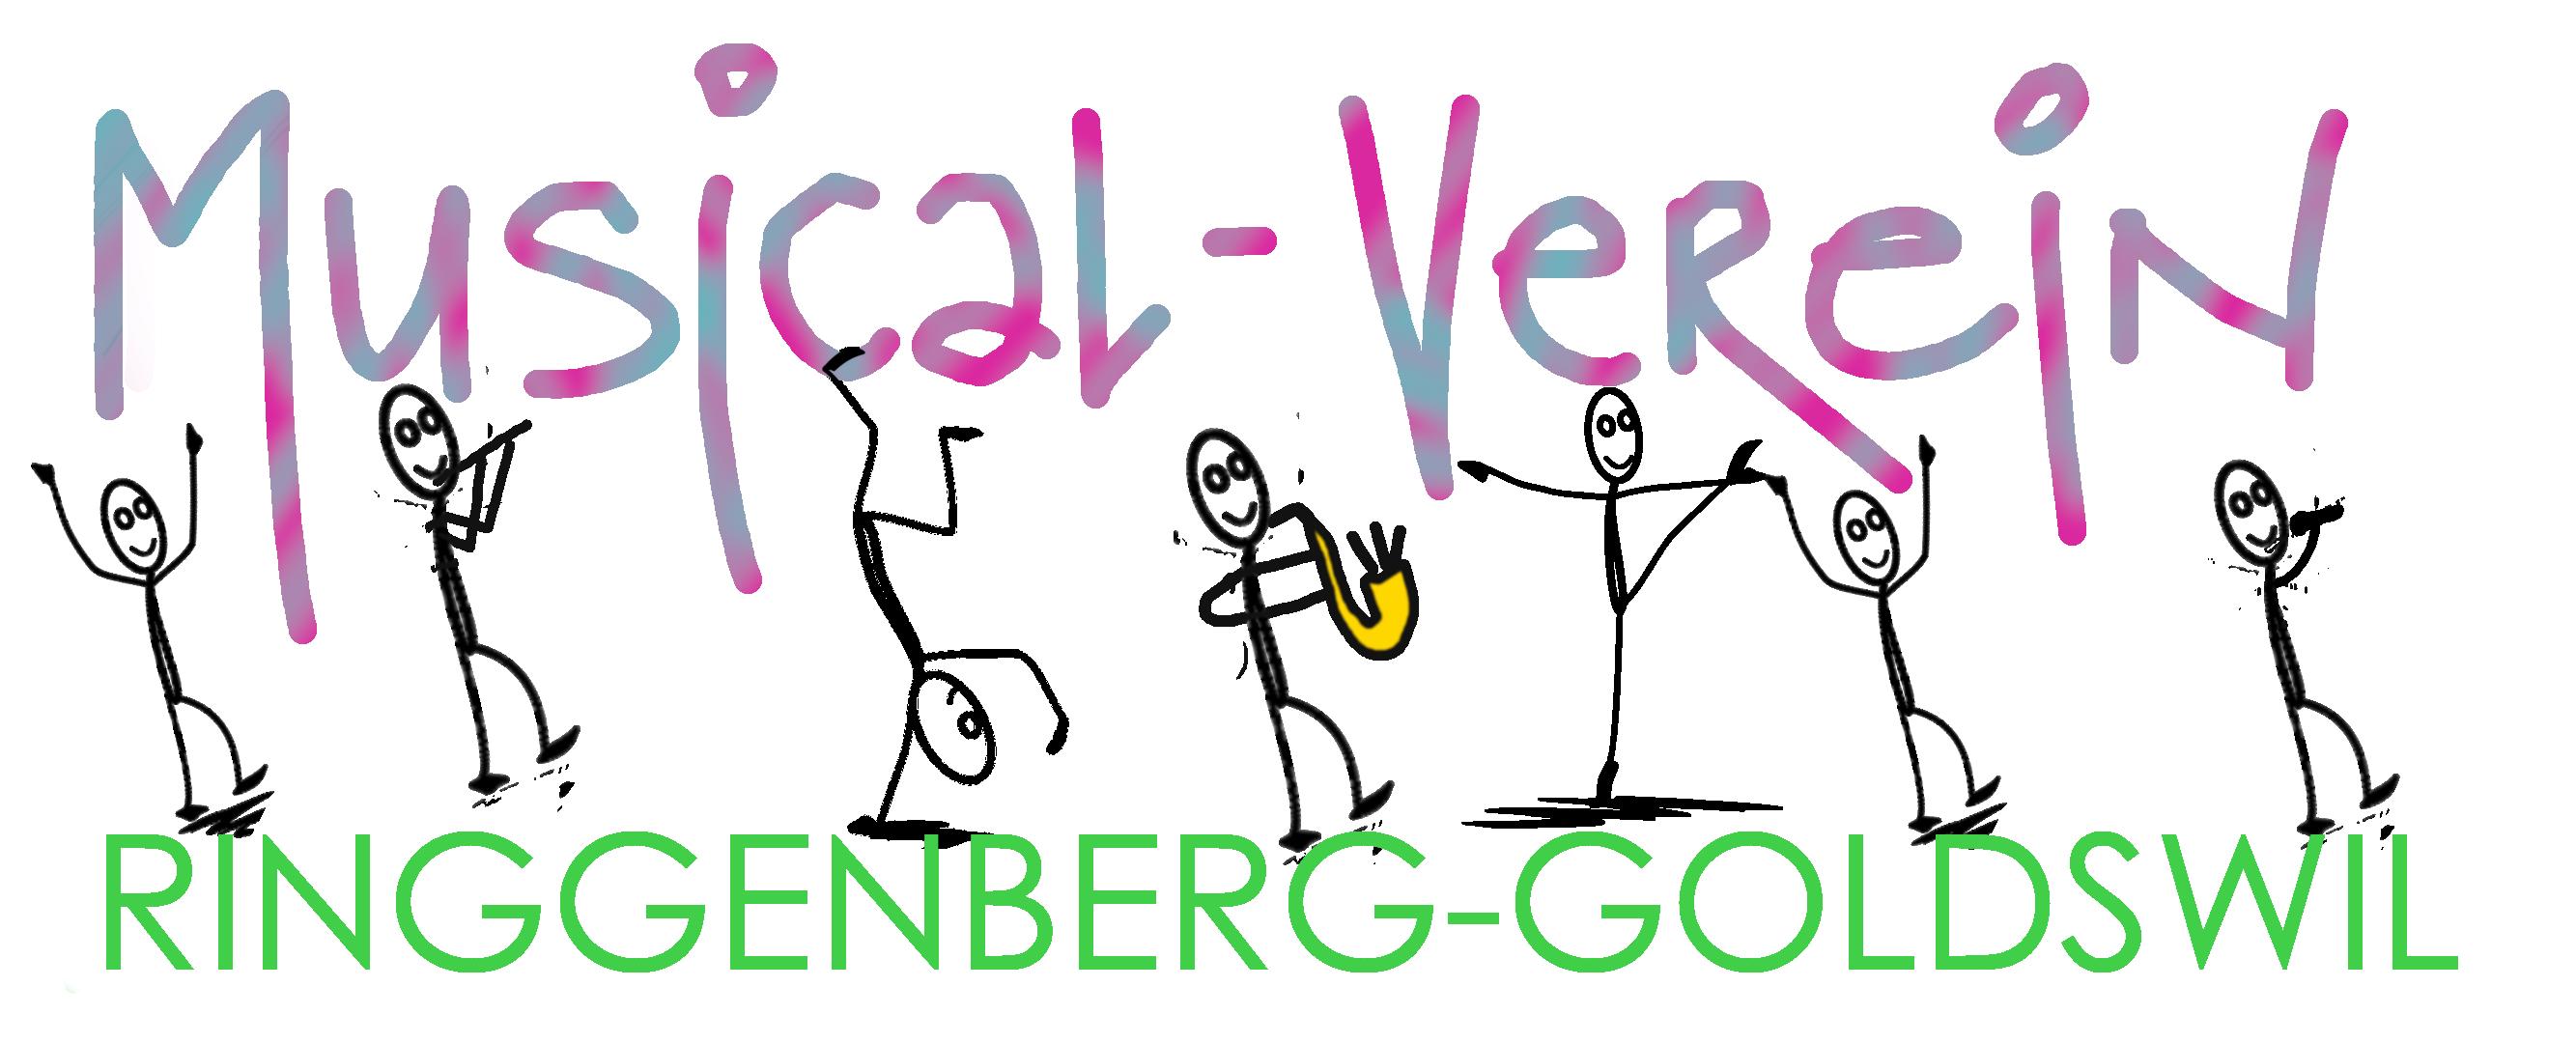 Musical-Verein Ringgenberg-Goldswil